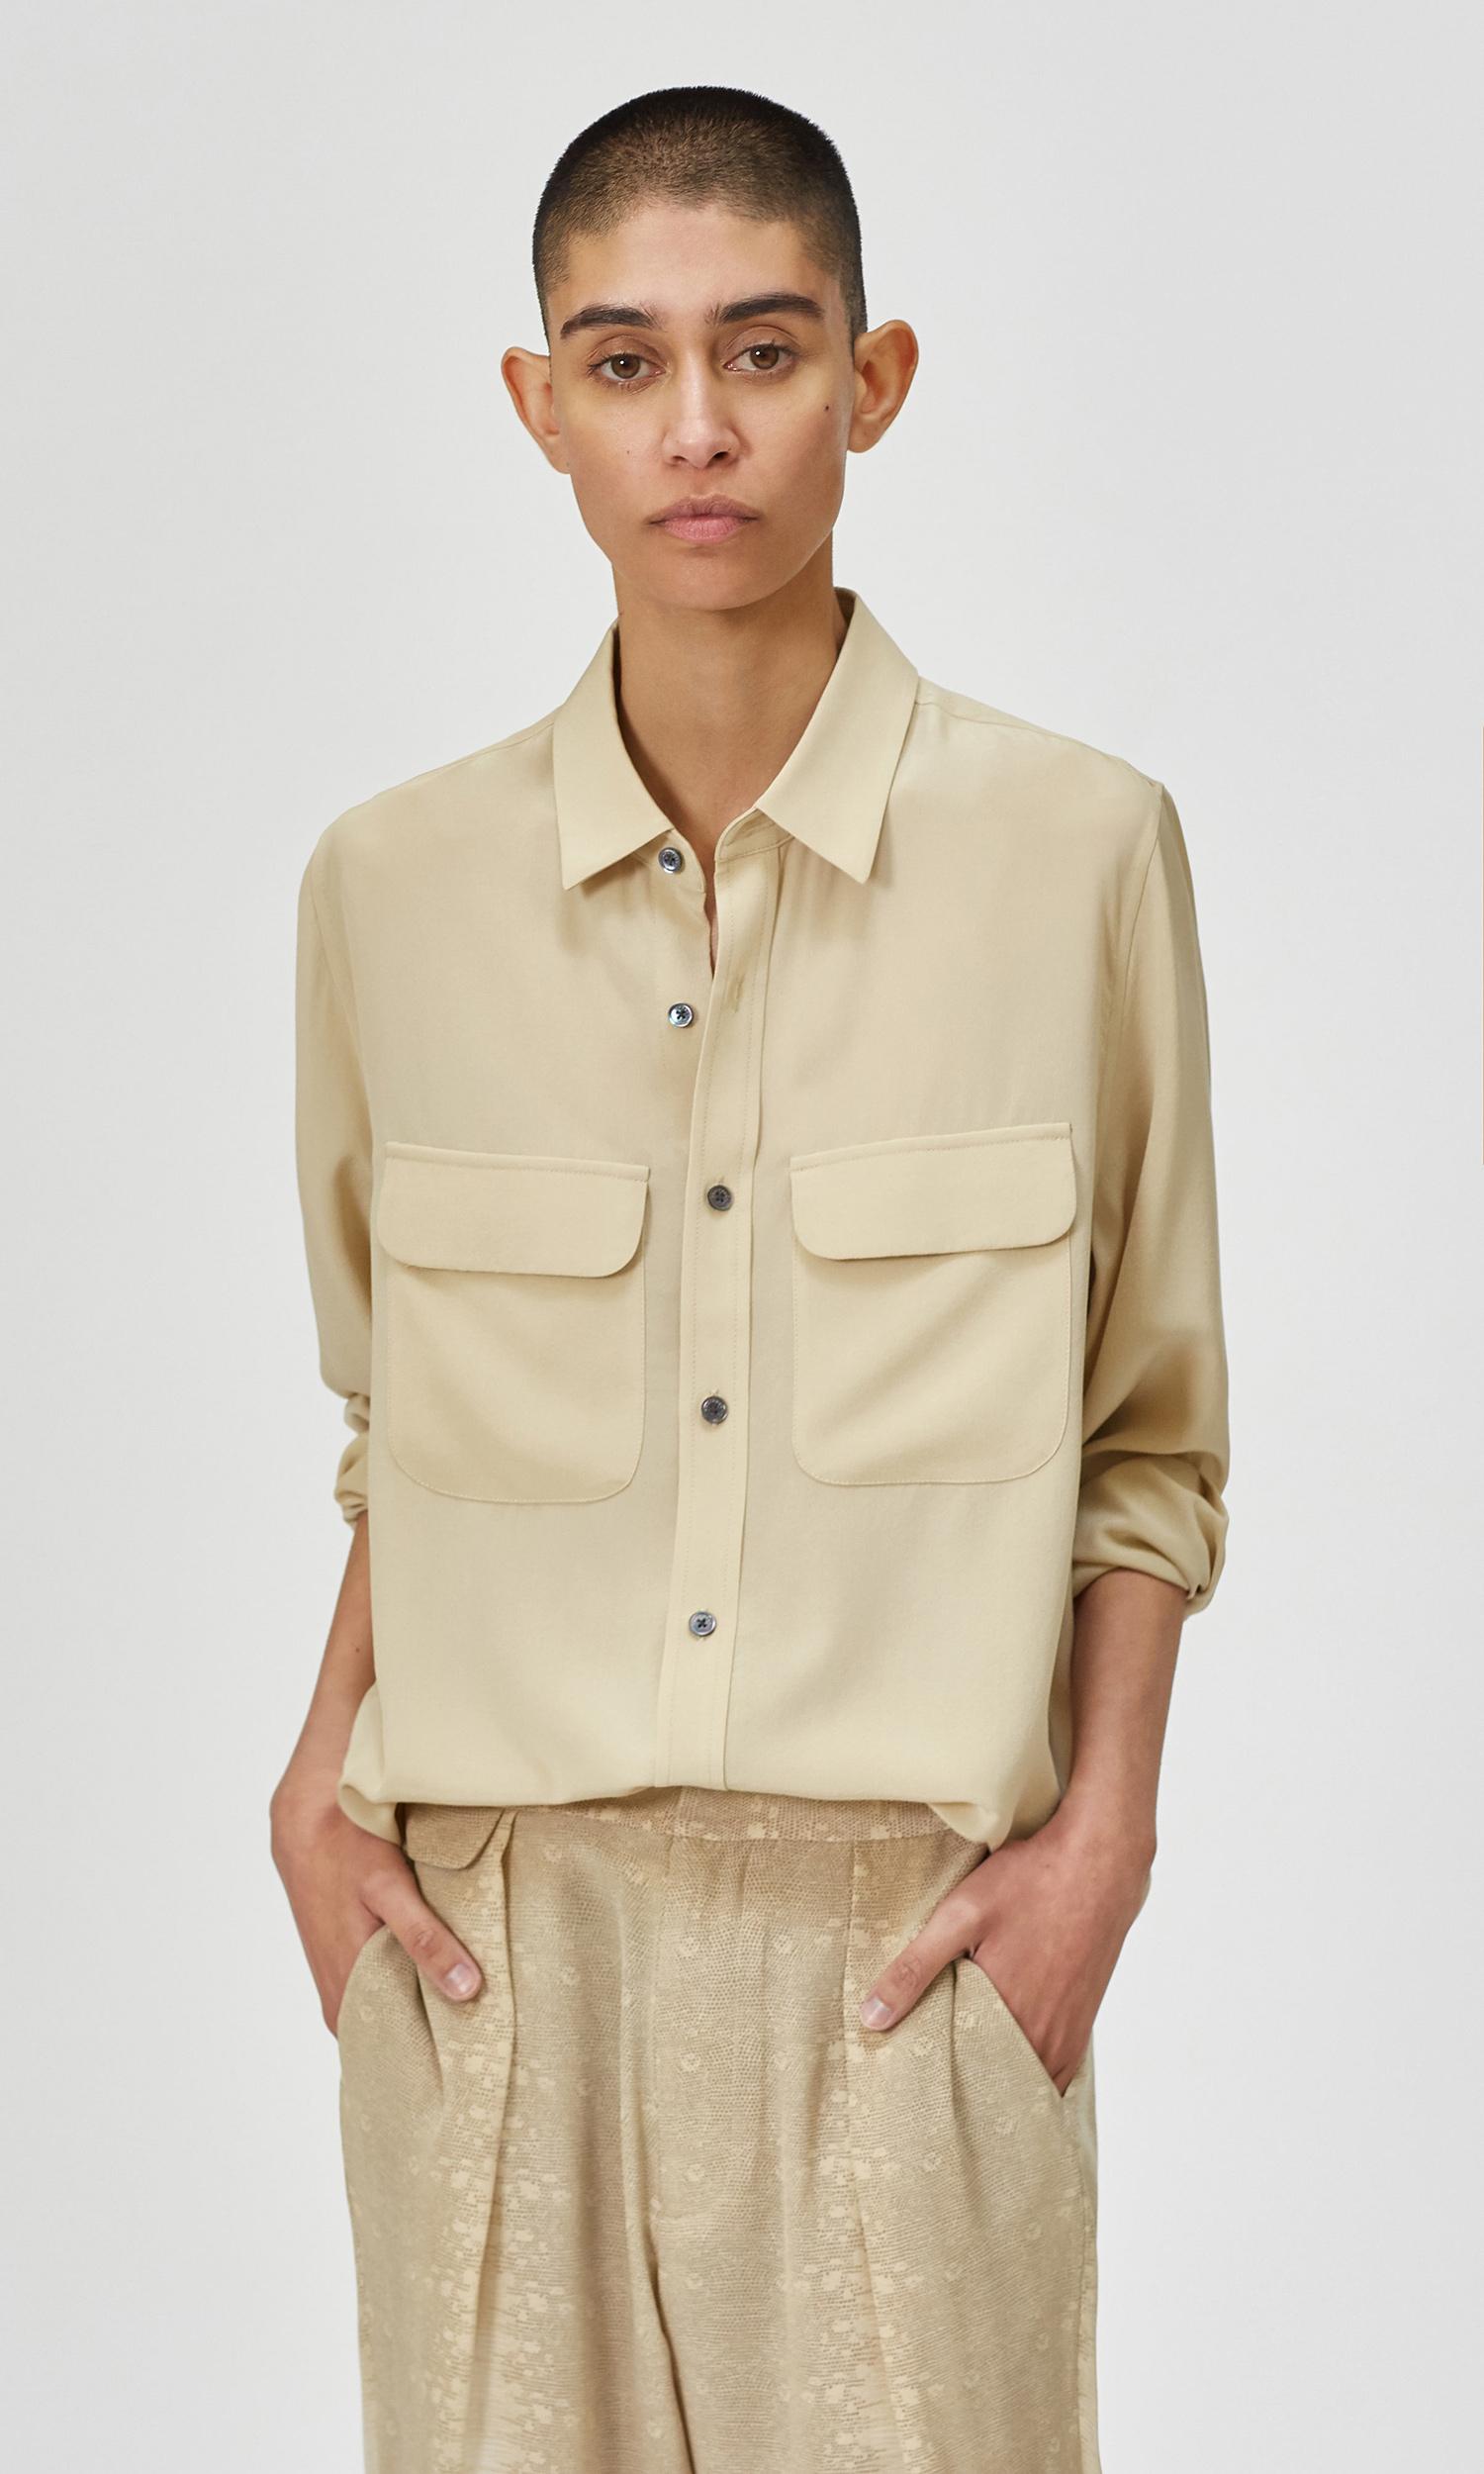 The Original Silk Shirt by Equipment